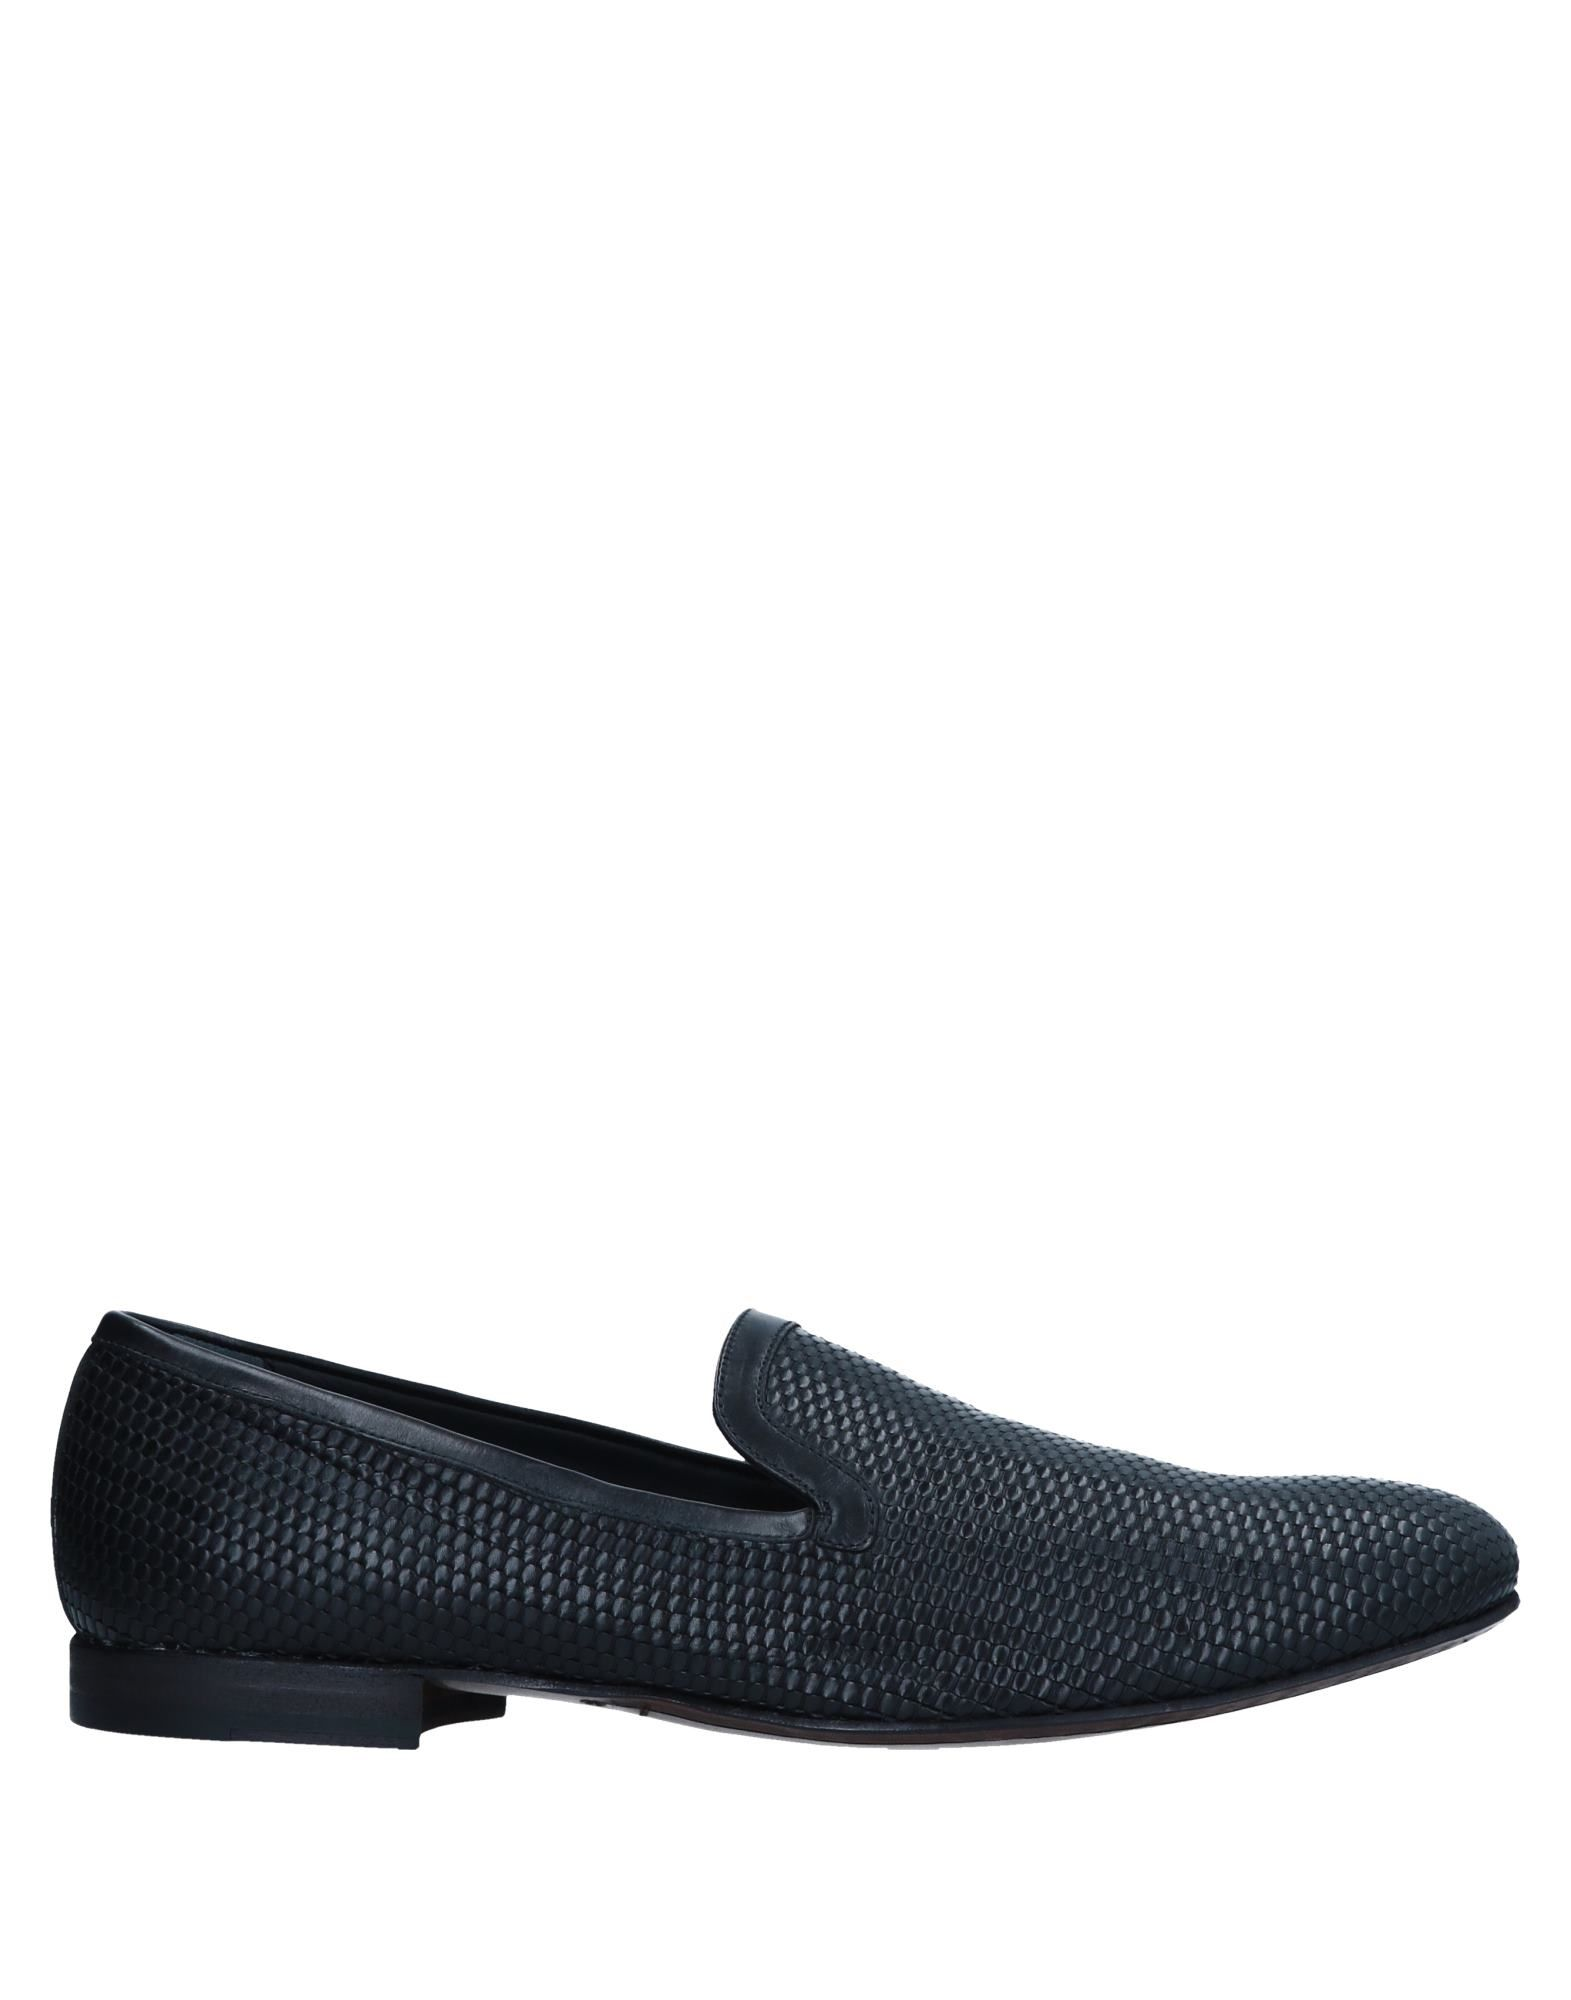 Alberto Guardiani Mokassins Herren  11557725MG Gute Qualität beliebte Schuhe